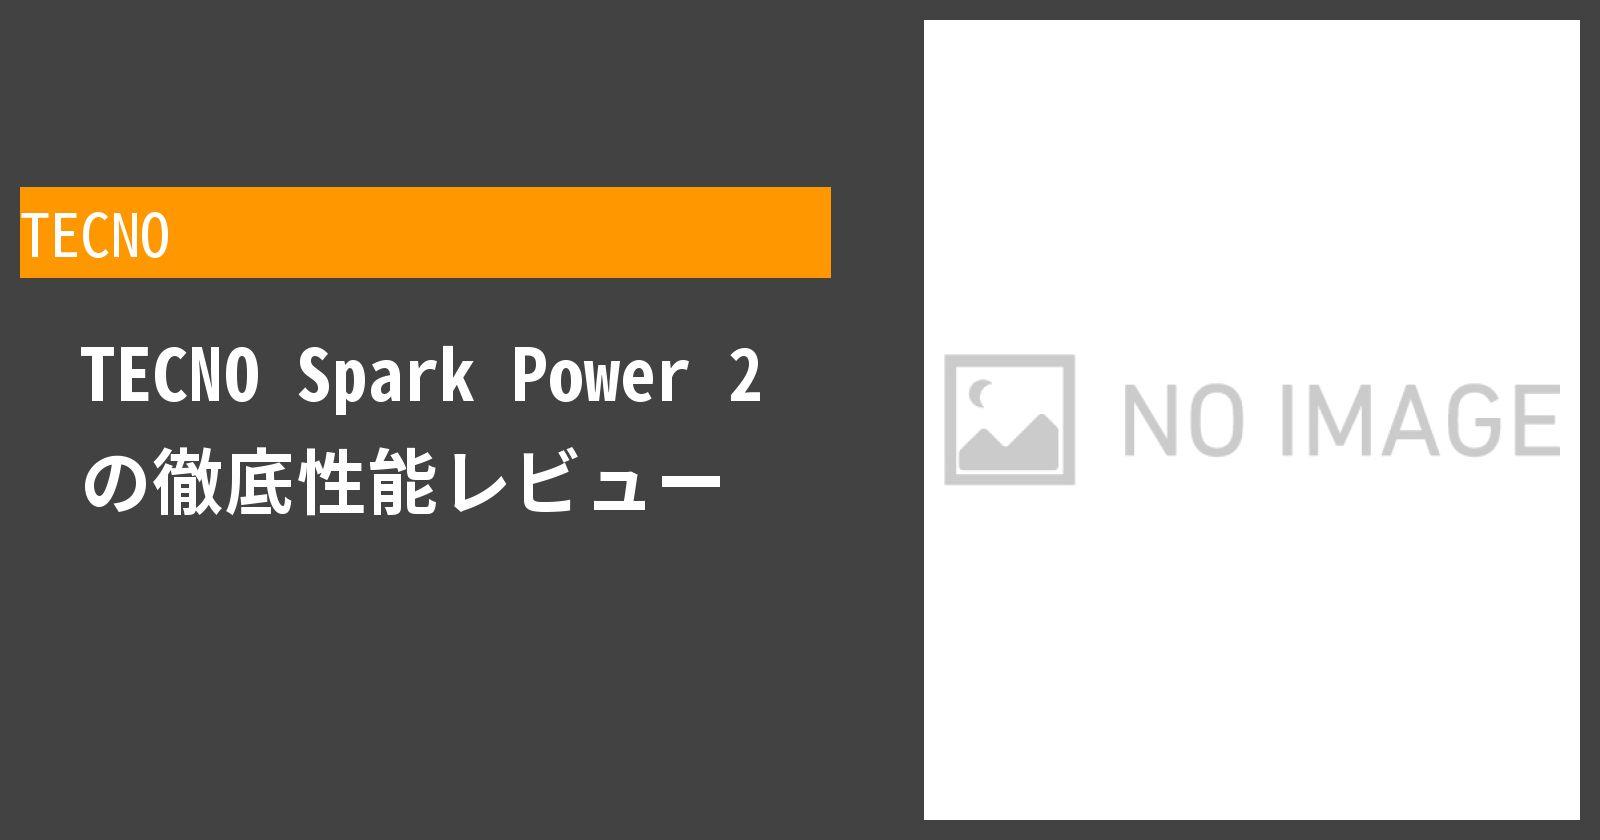 TECNO Spark Power 2 の徹底性能レビュー